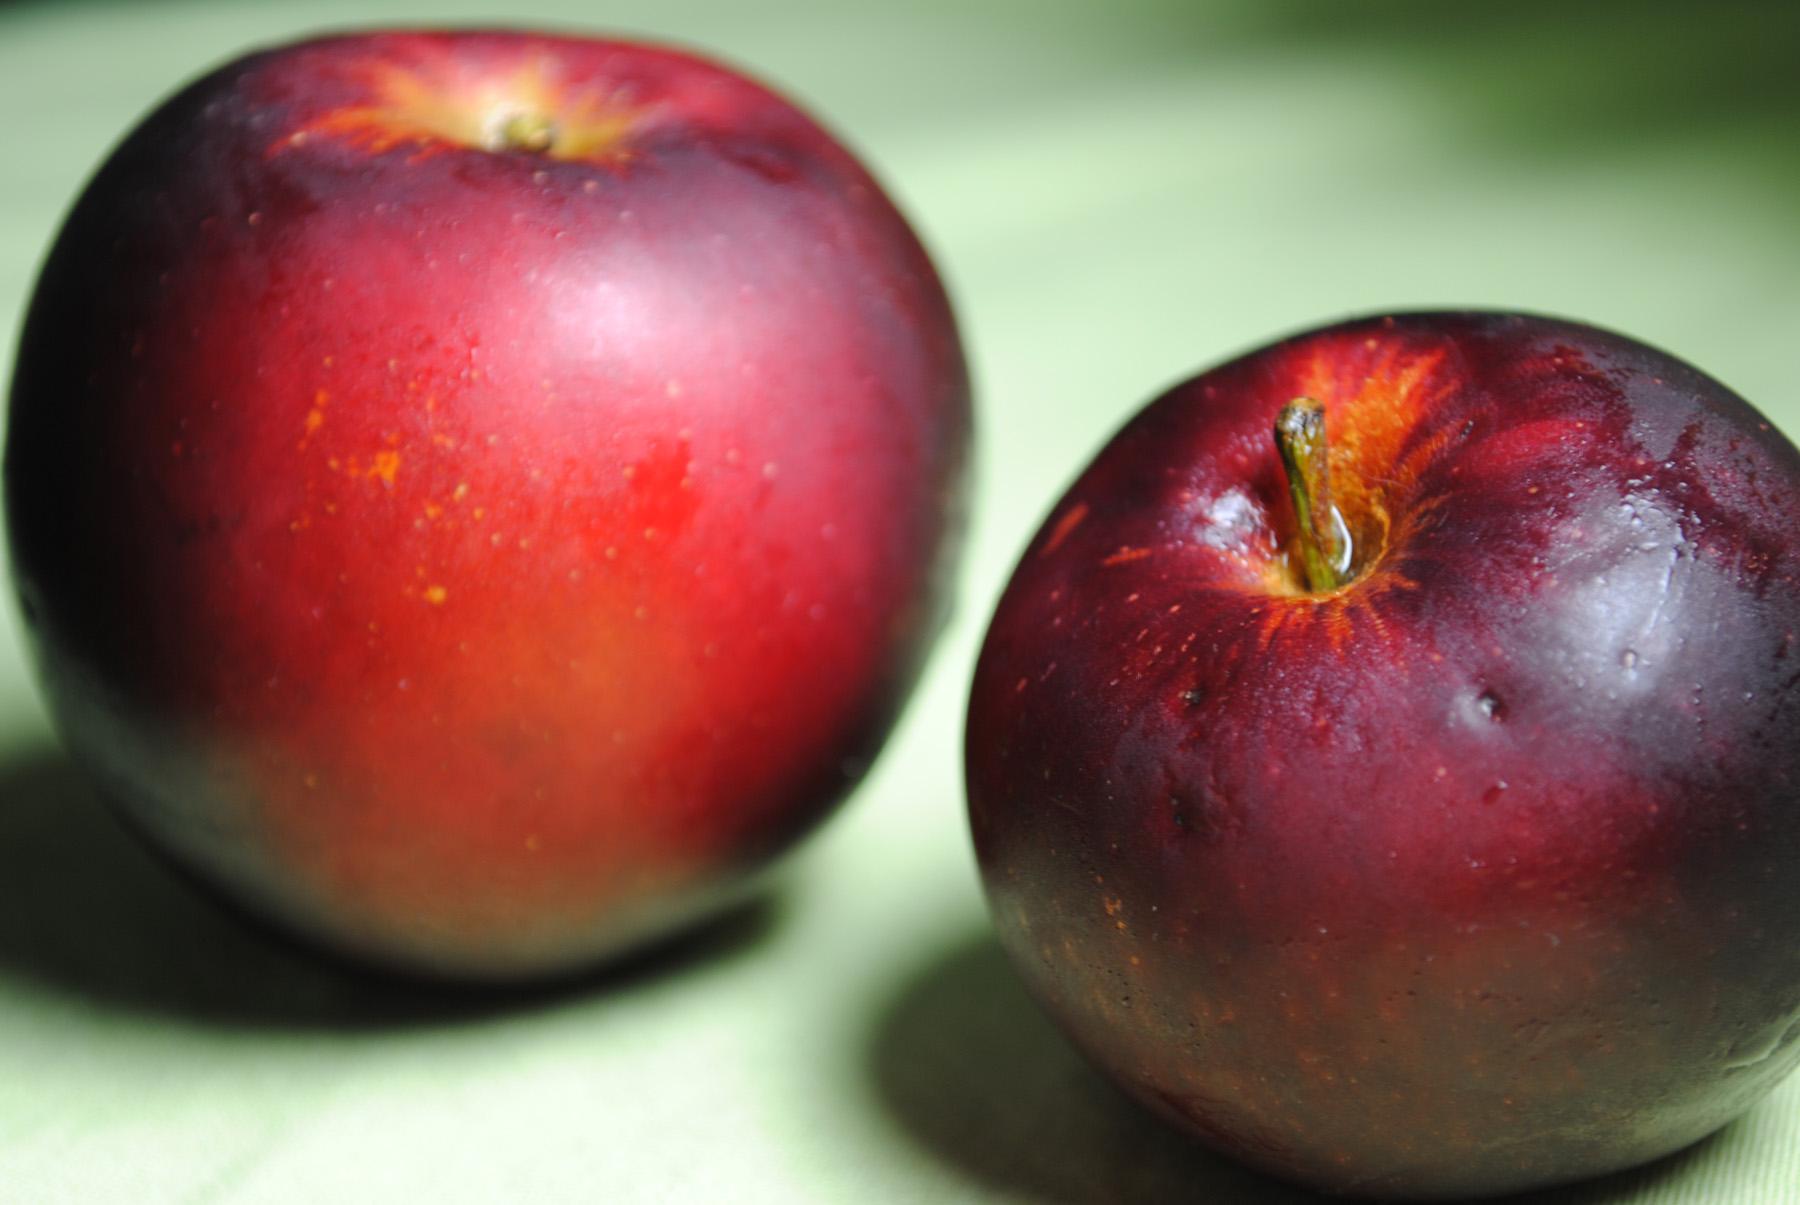 apple - photo #16